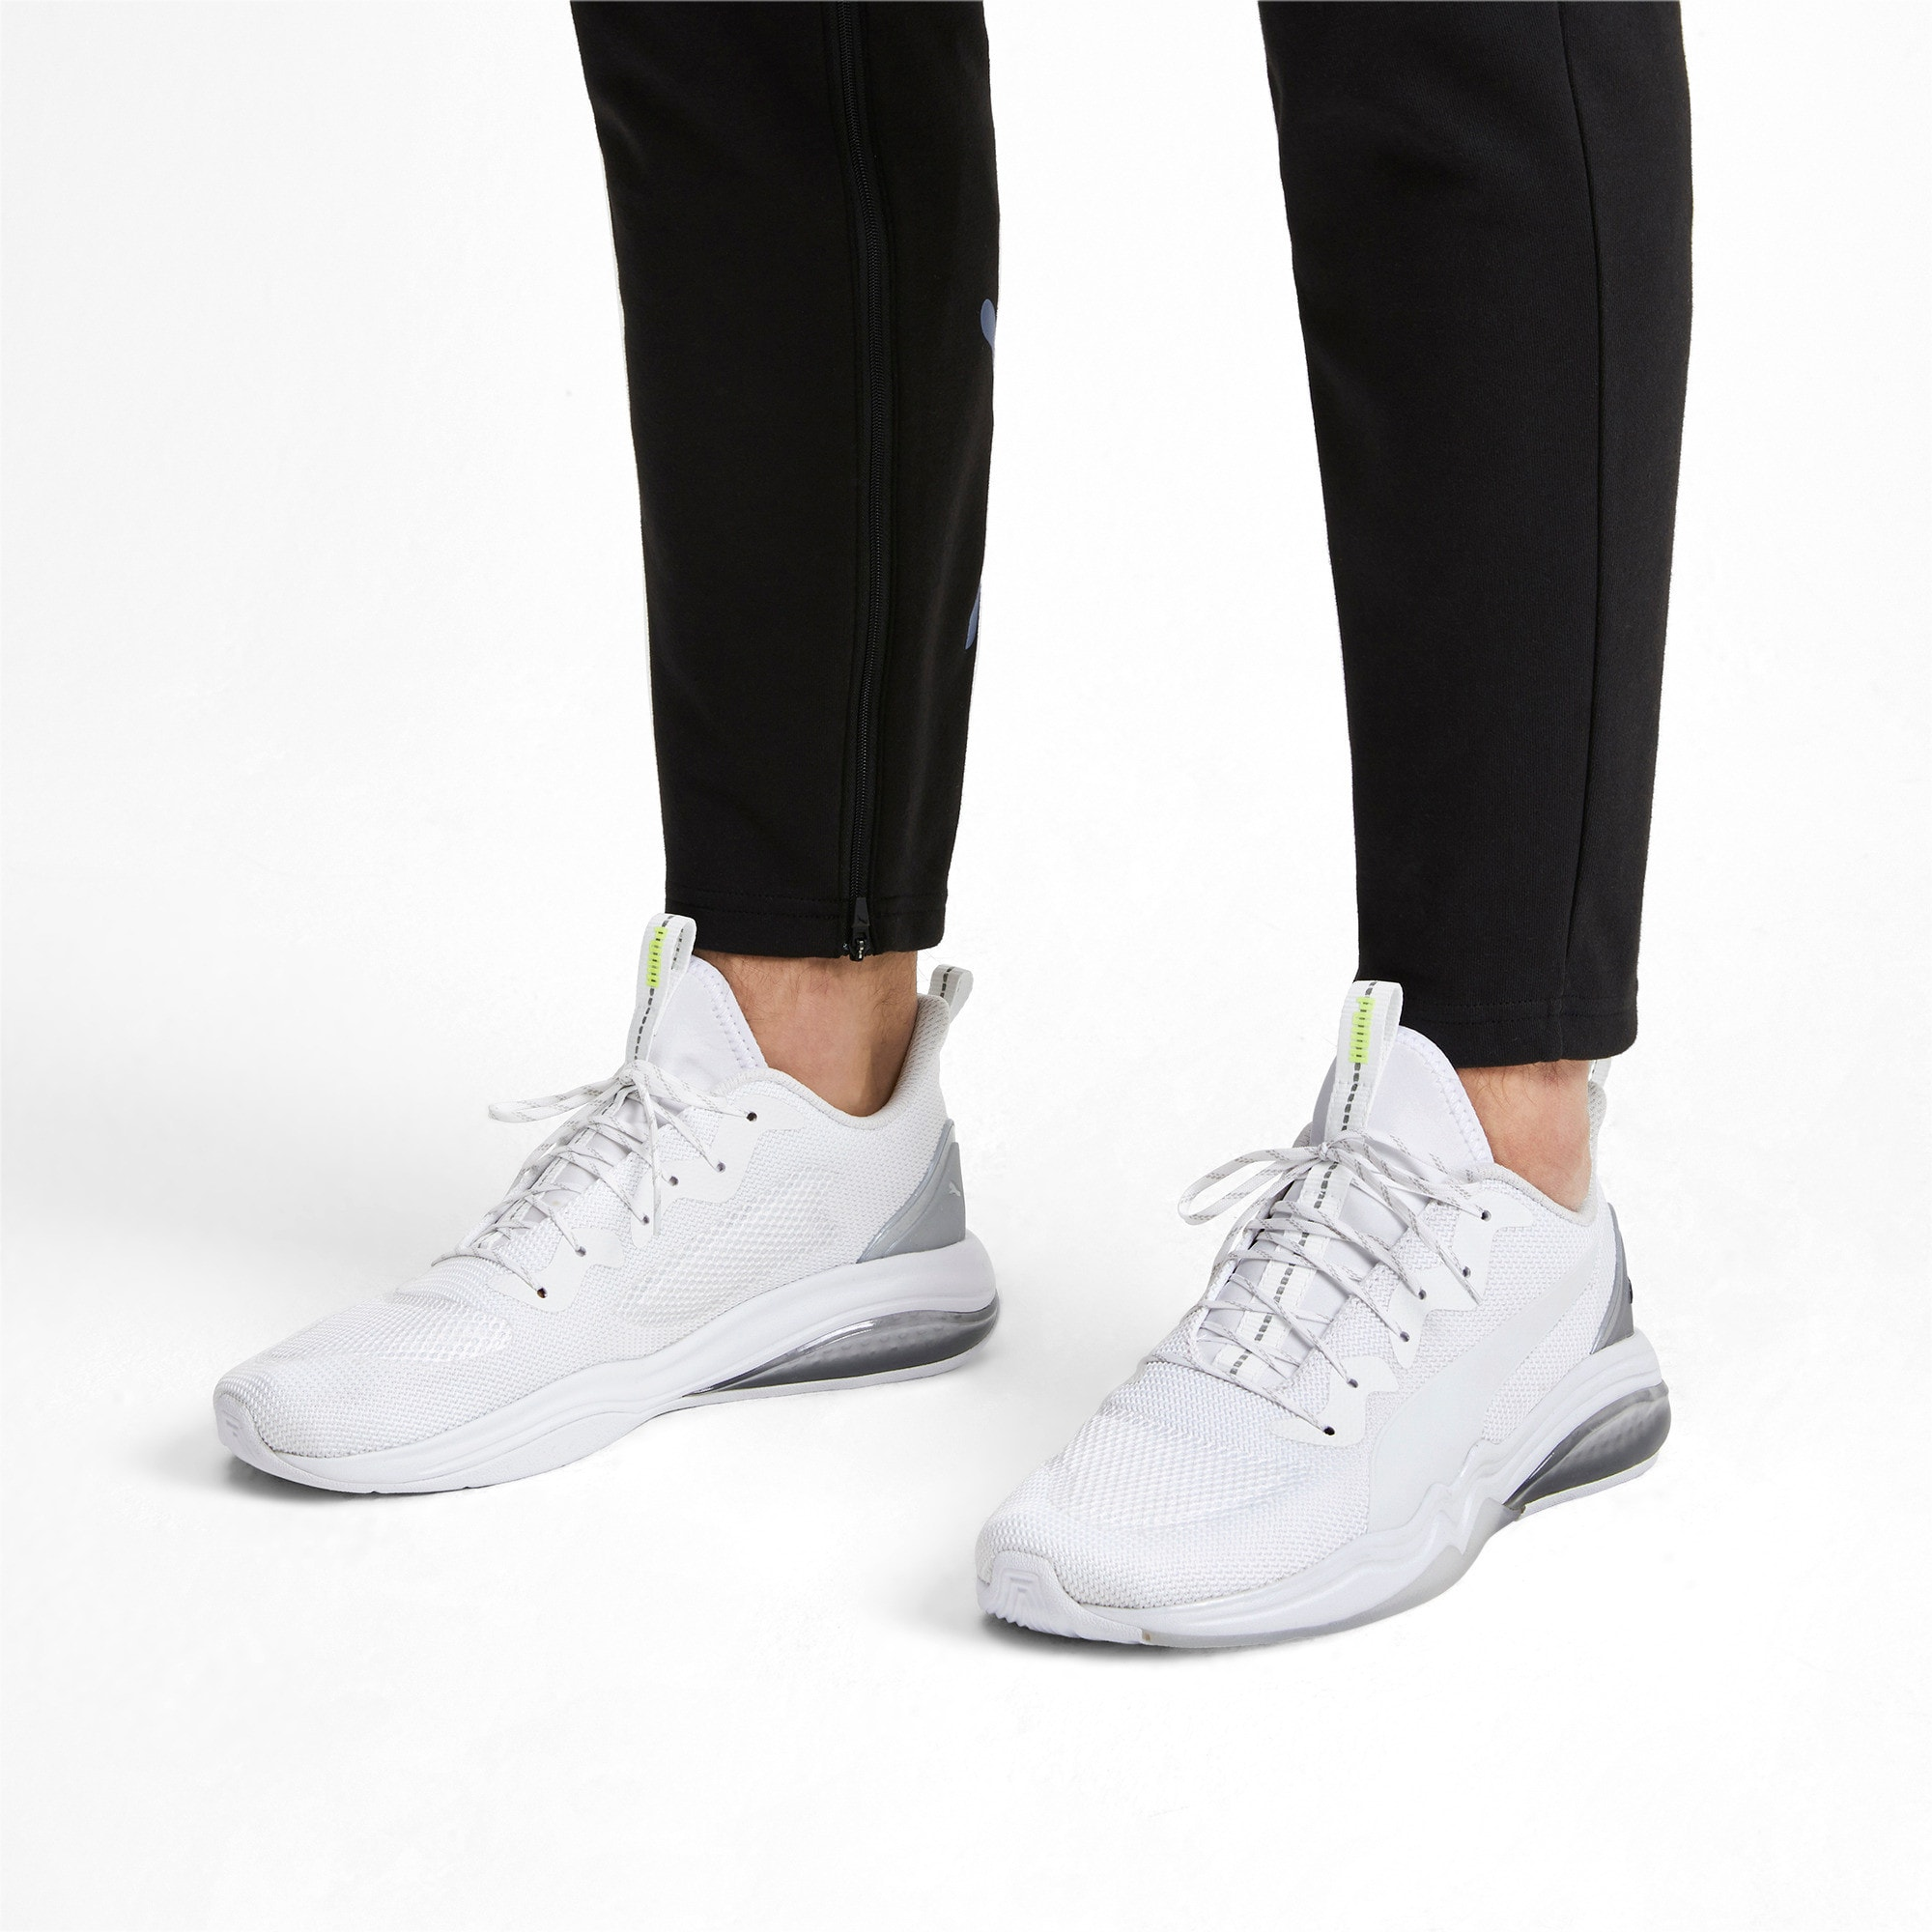 Thumbnail 2 of LQDCELL Tension Lights Men's Training Shoes, Puma White-Puma Silver, medium